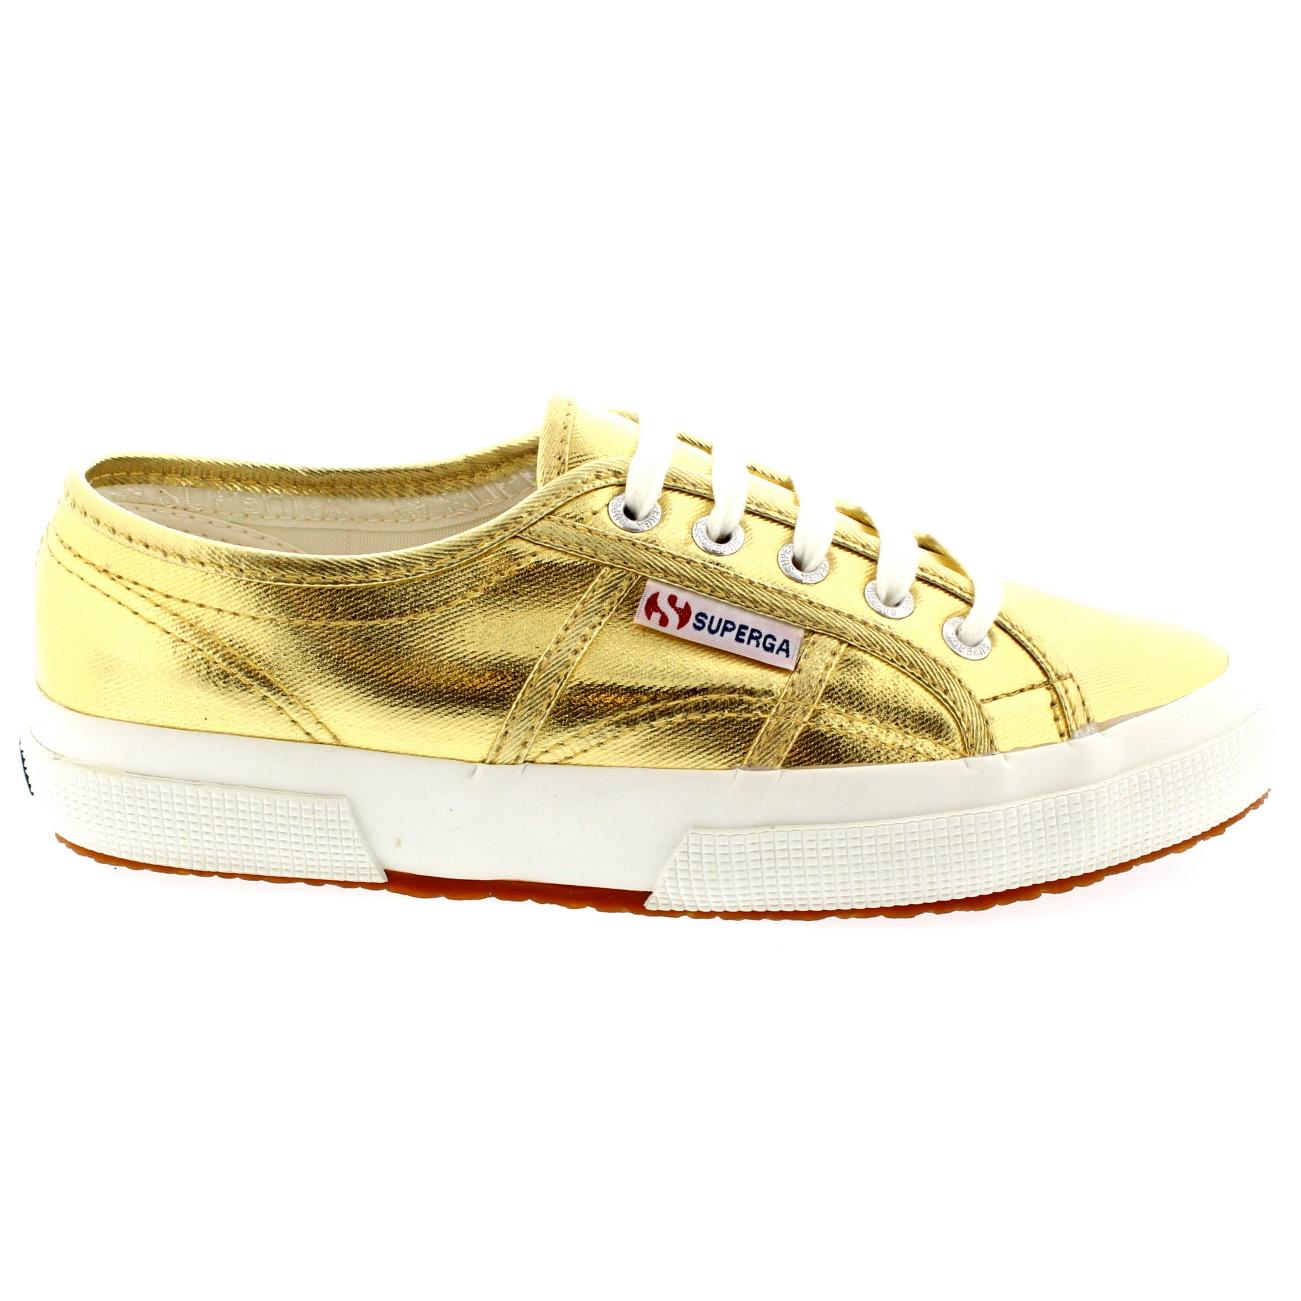 e0657957686d9 Ladies Superga 2750 Cotmetu Shoes Metallic Flat Casual Low Top Trainer All  Sizes | eBay